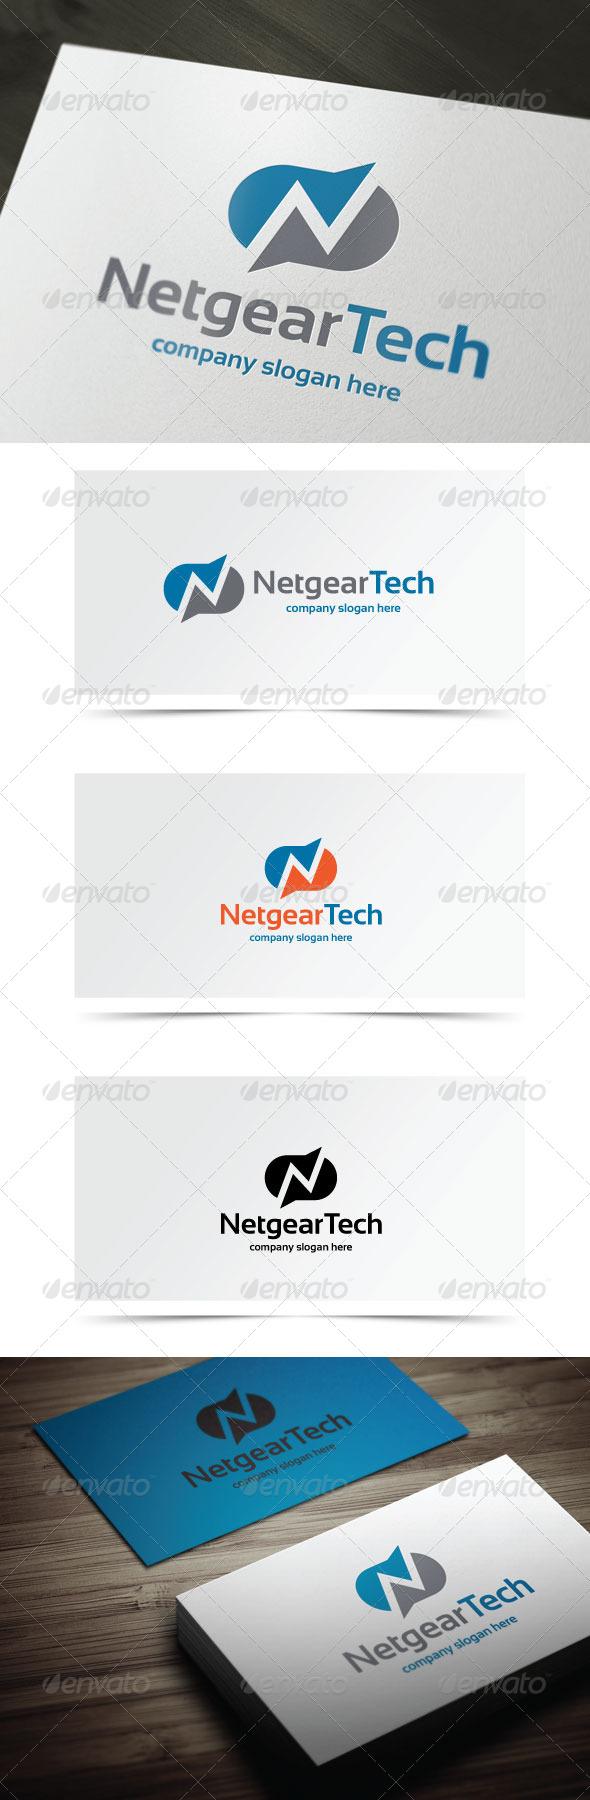 GraphicRiver Netgear Tech 7263366